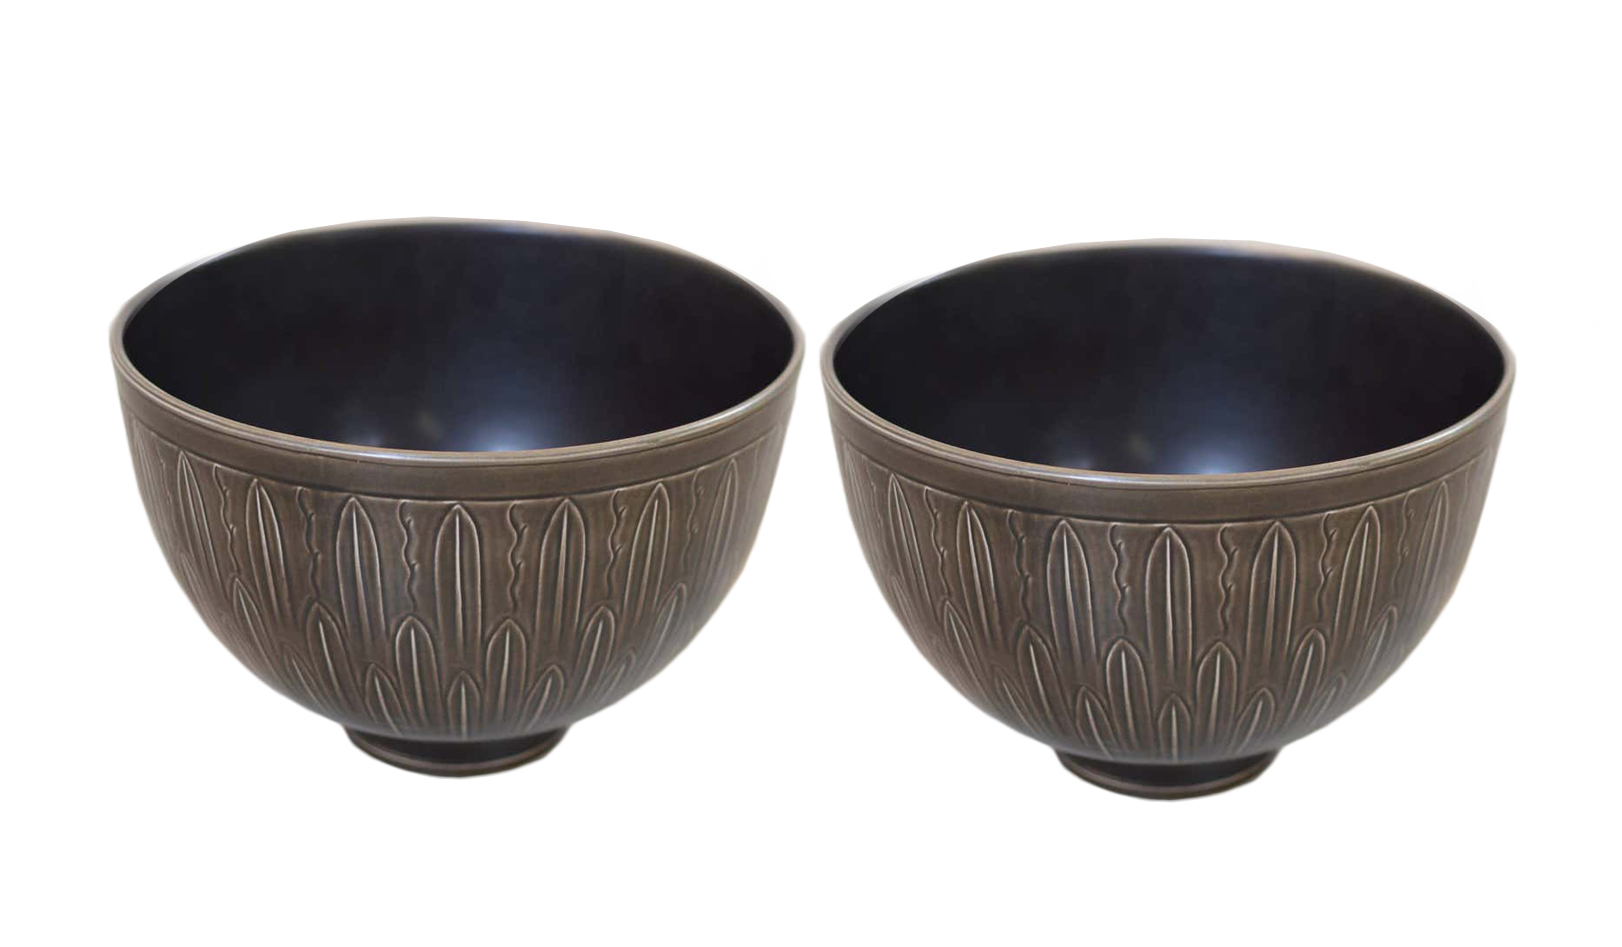 Nils Johan Thorvald Thorsson bowls 1930s